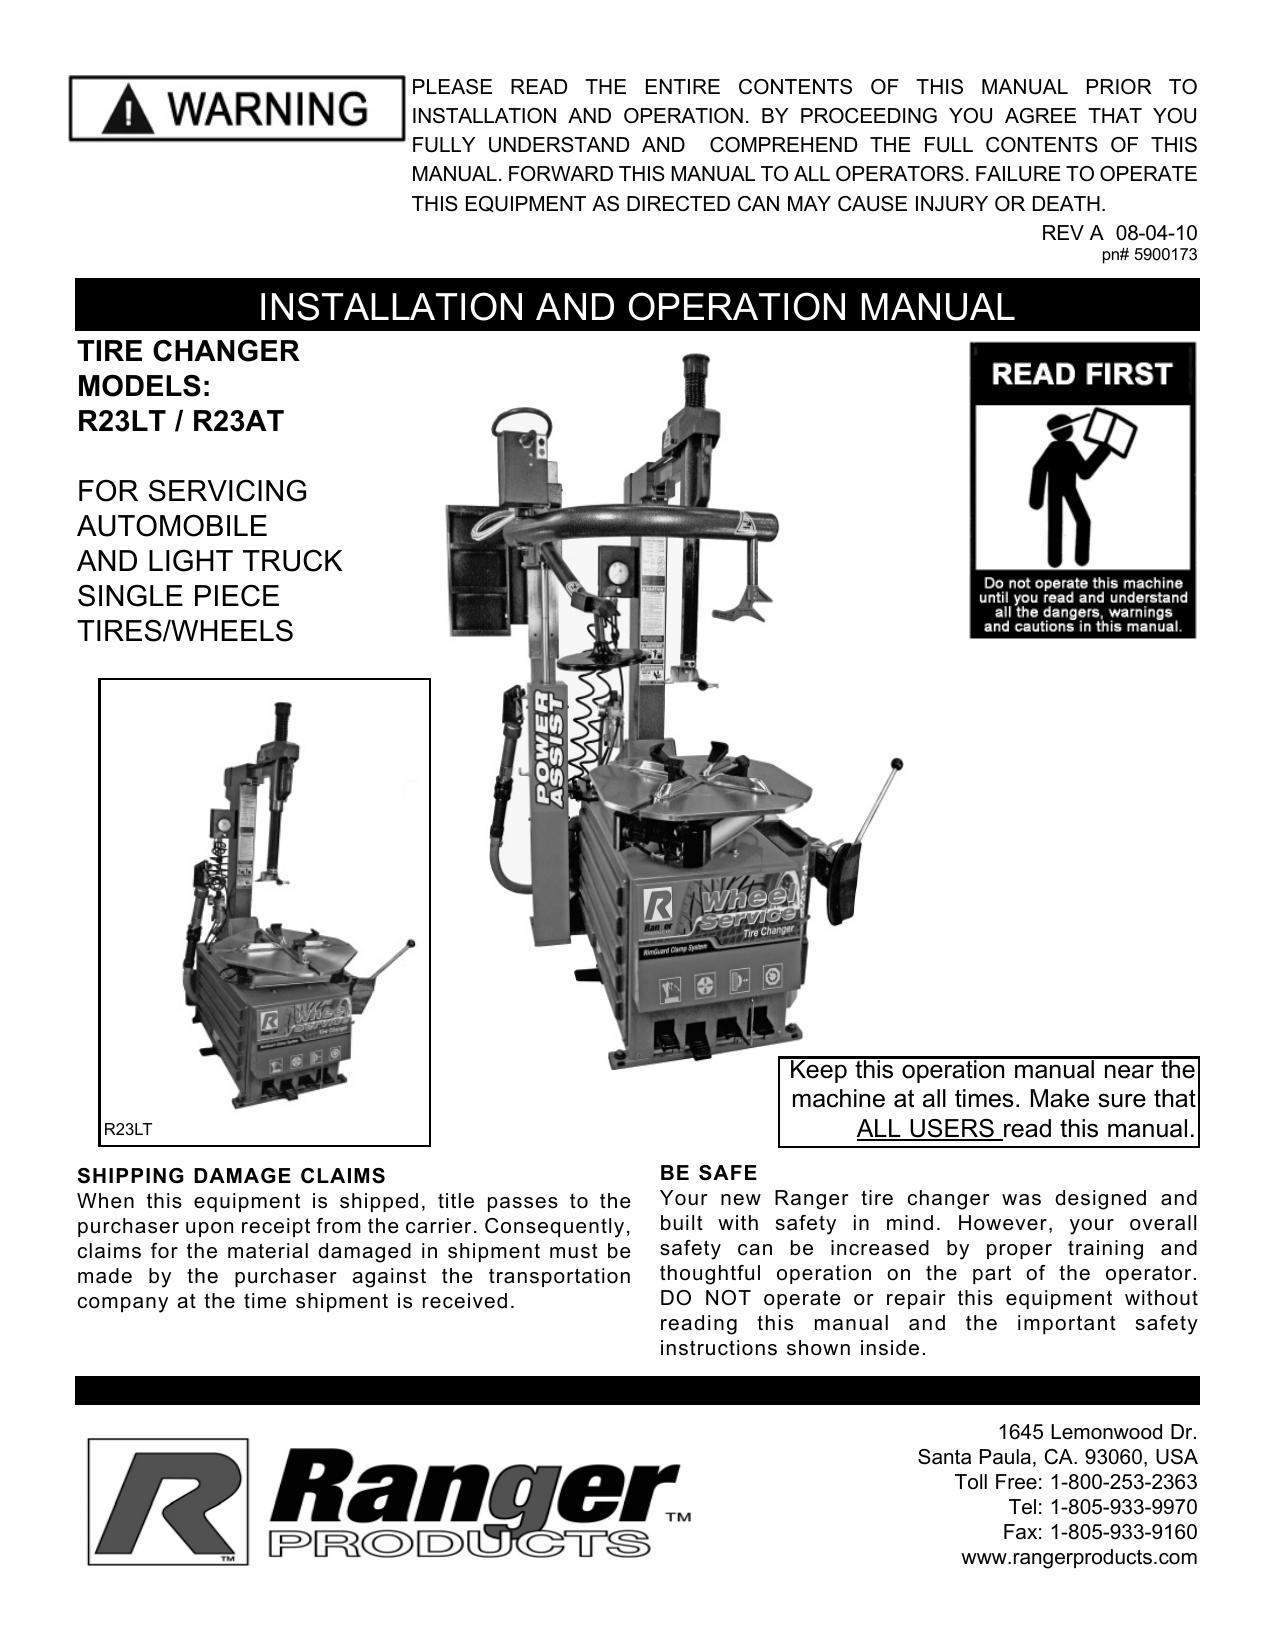 R23AT Manual Revised 06-10.indd | manualzz.com on